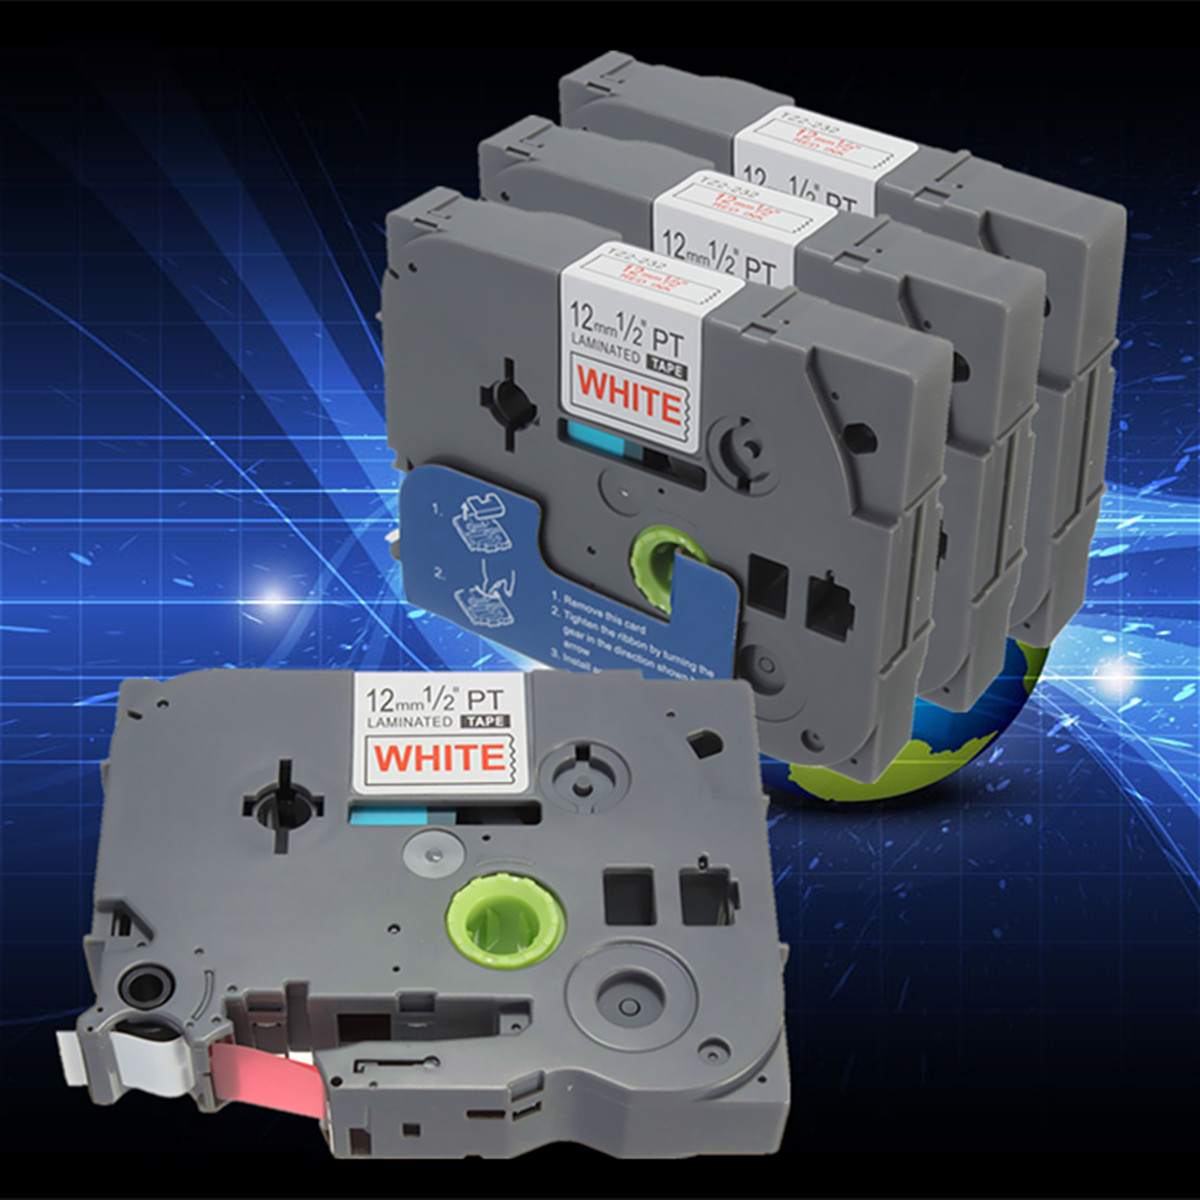 1PC 11 Colors TZ Label Tape Cartridge Compatible for P-Touch Printer - 12mm x 8m